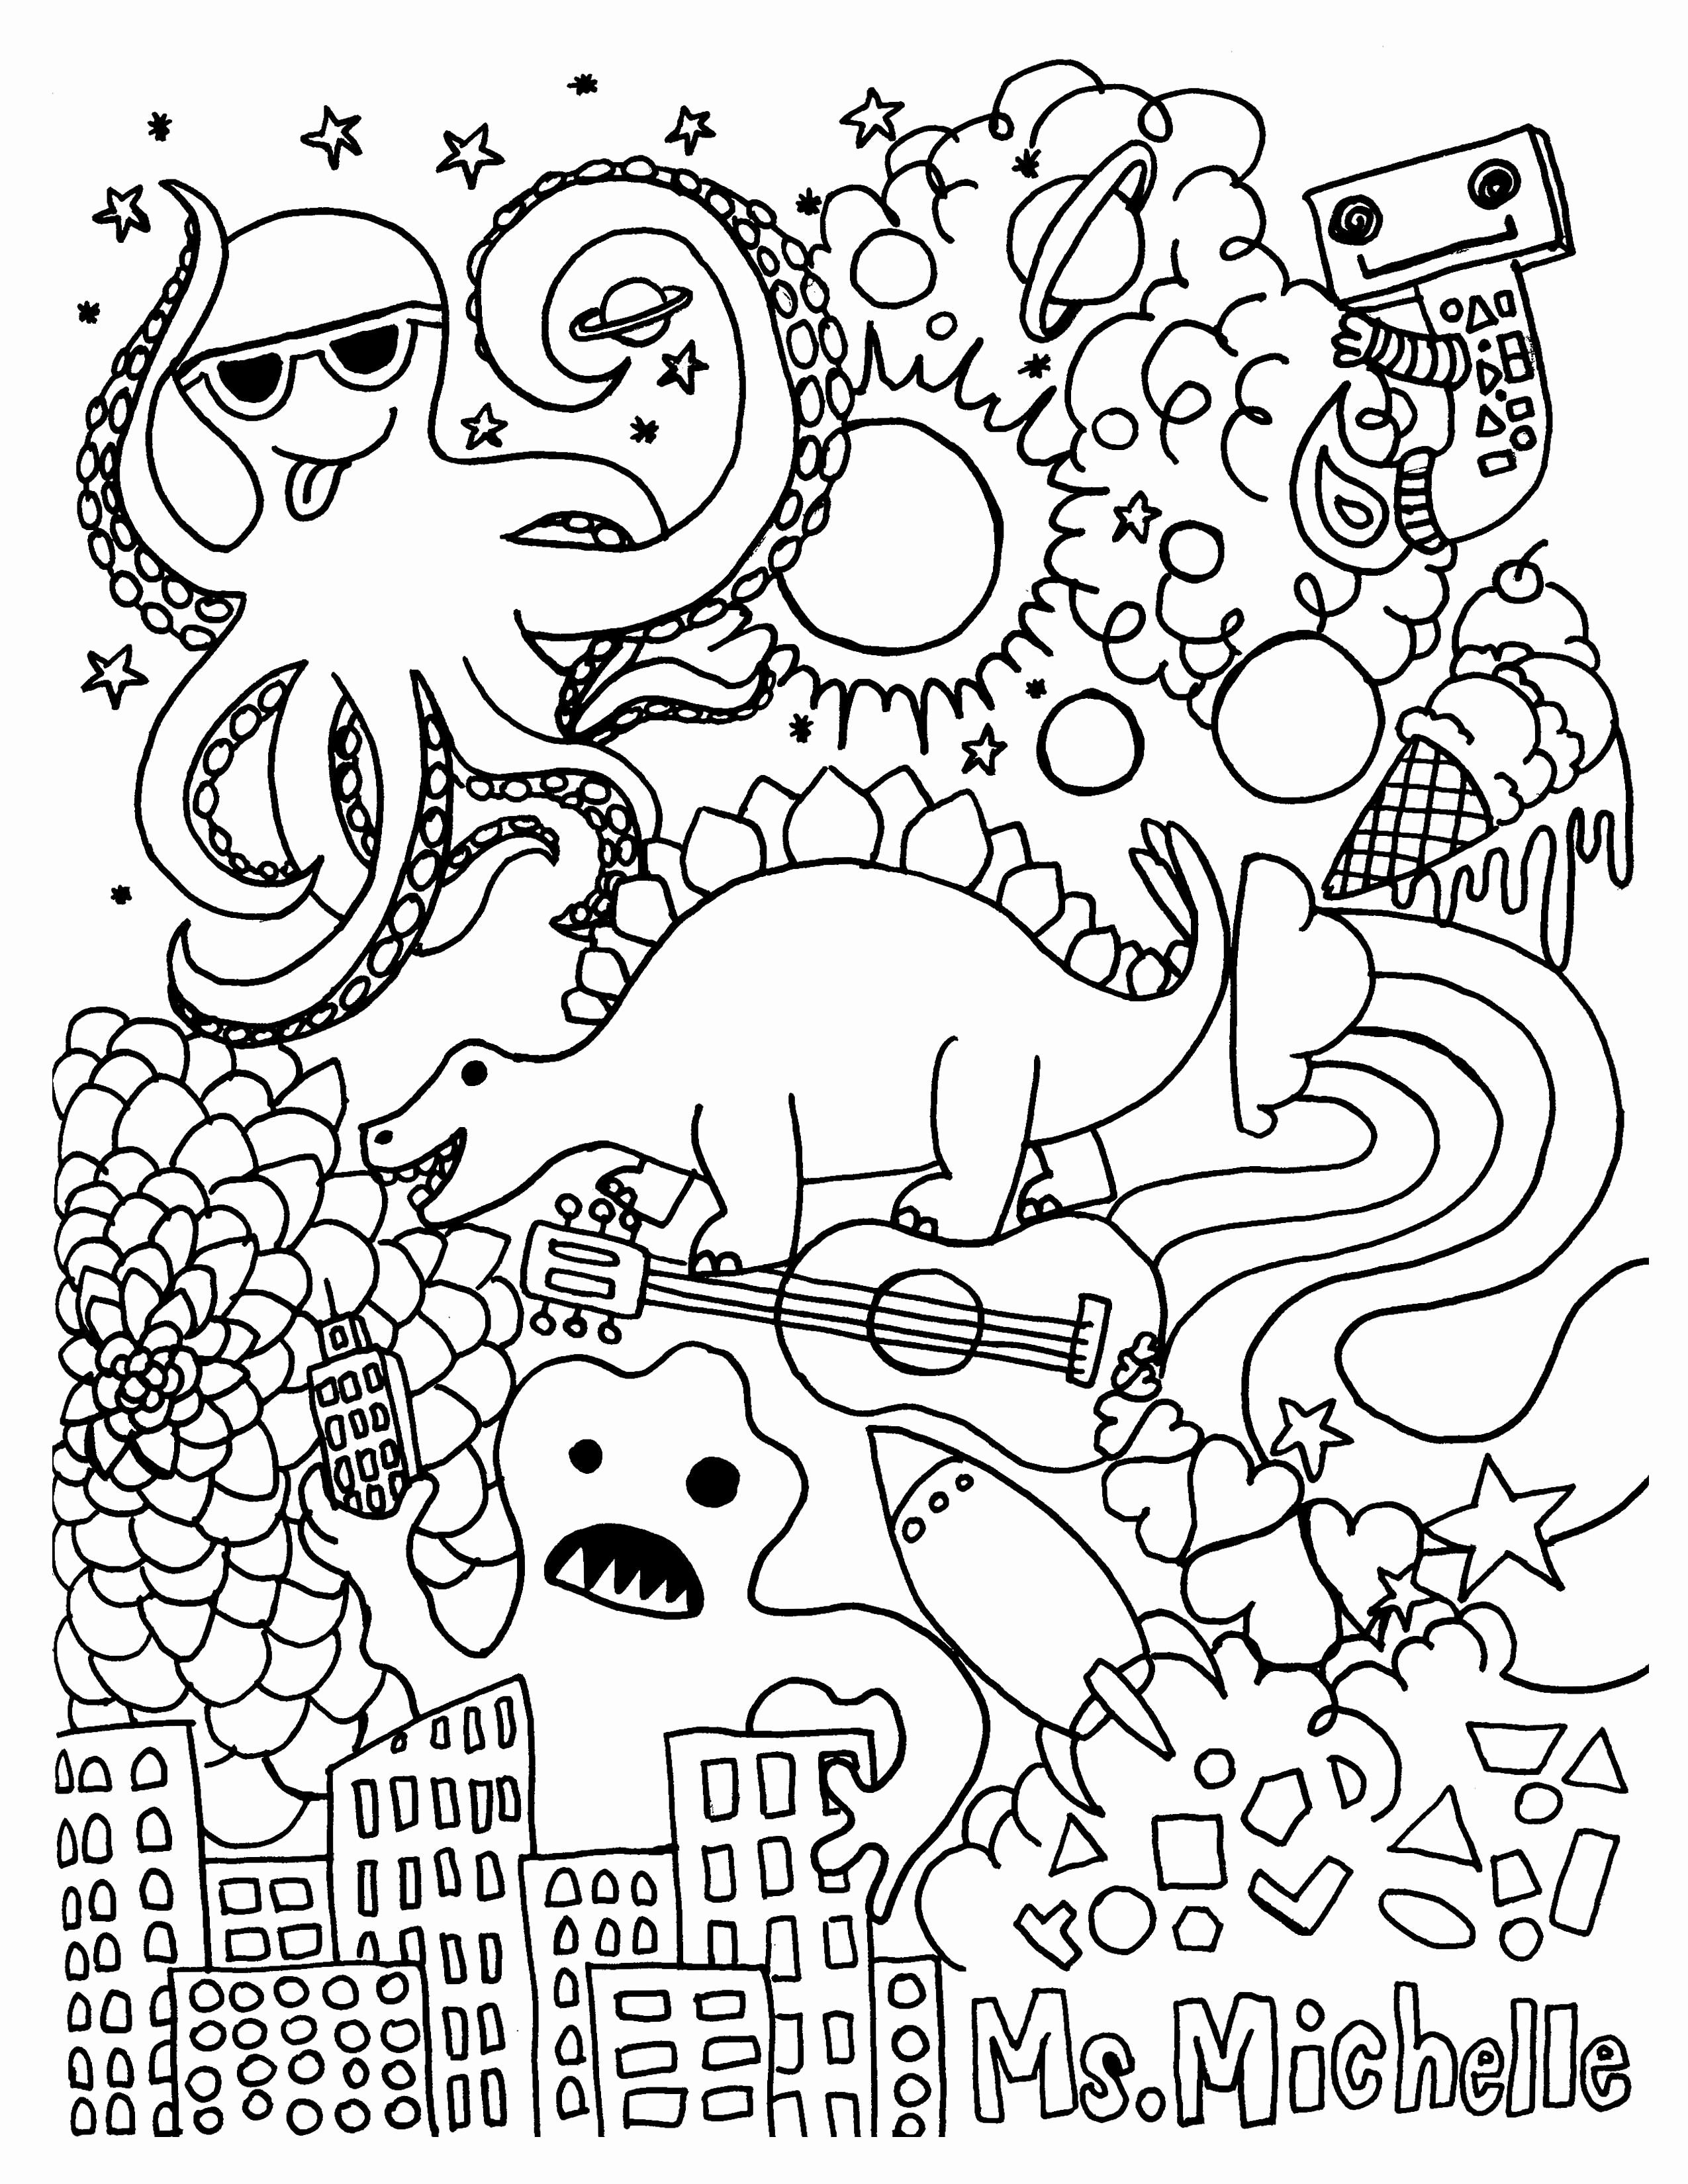 Coloring Pages Of Shopkins Season 3 At Getdrawings Com